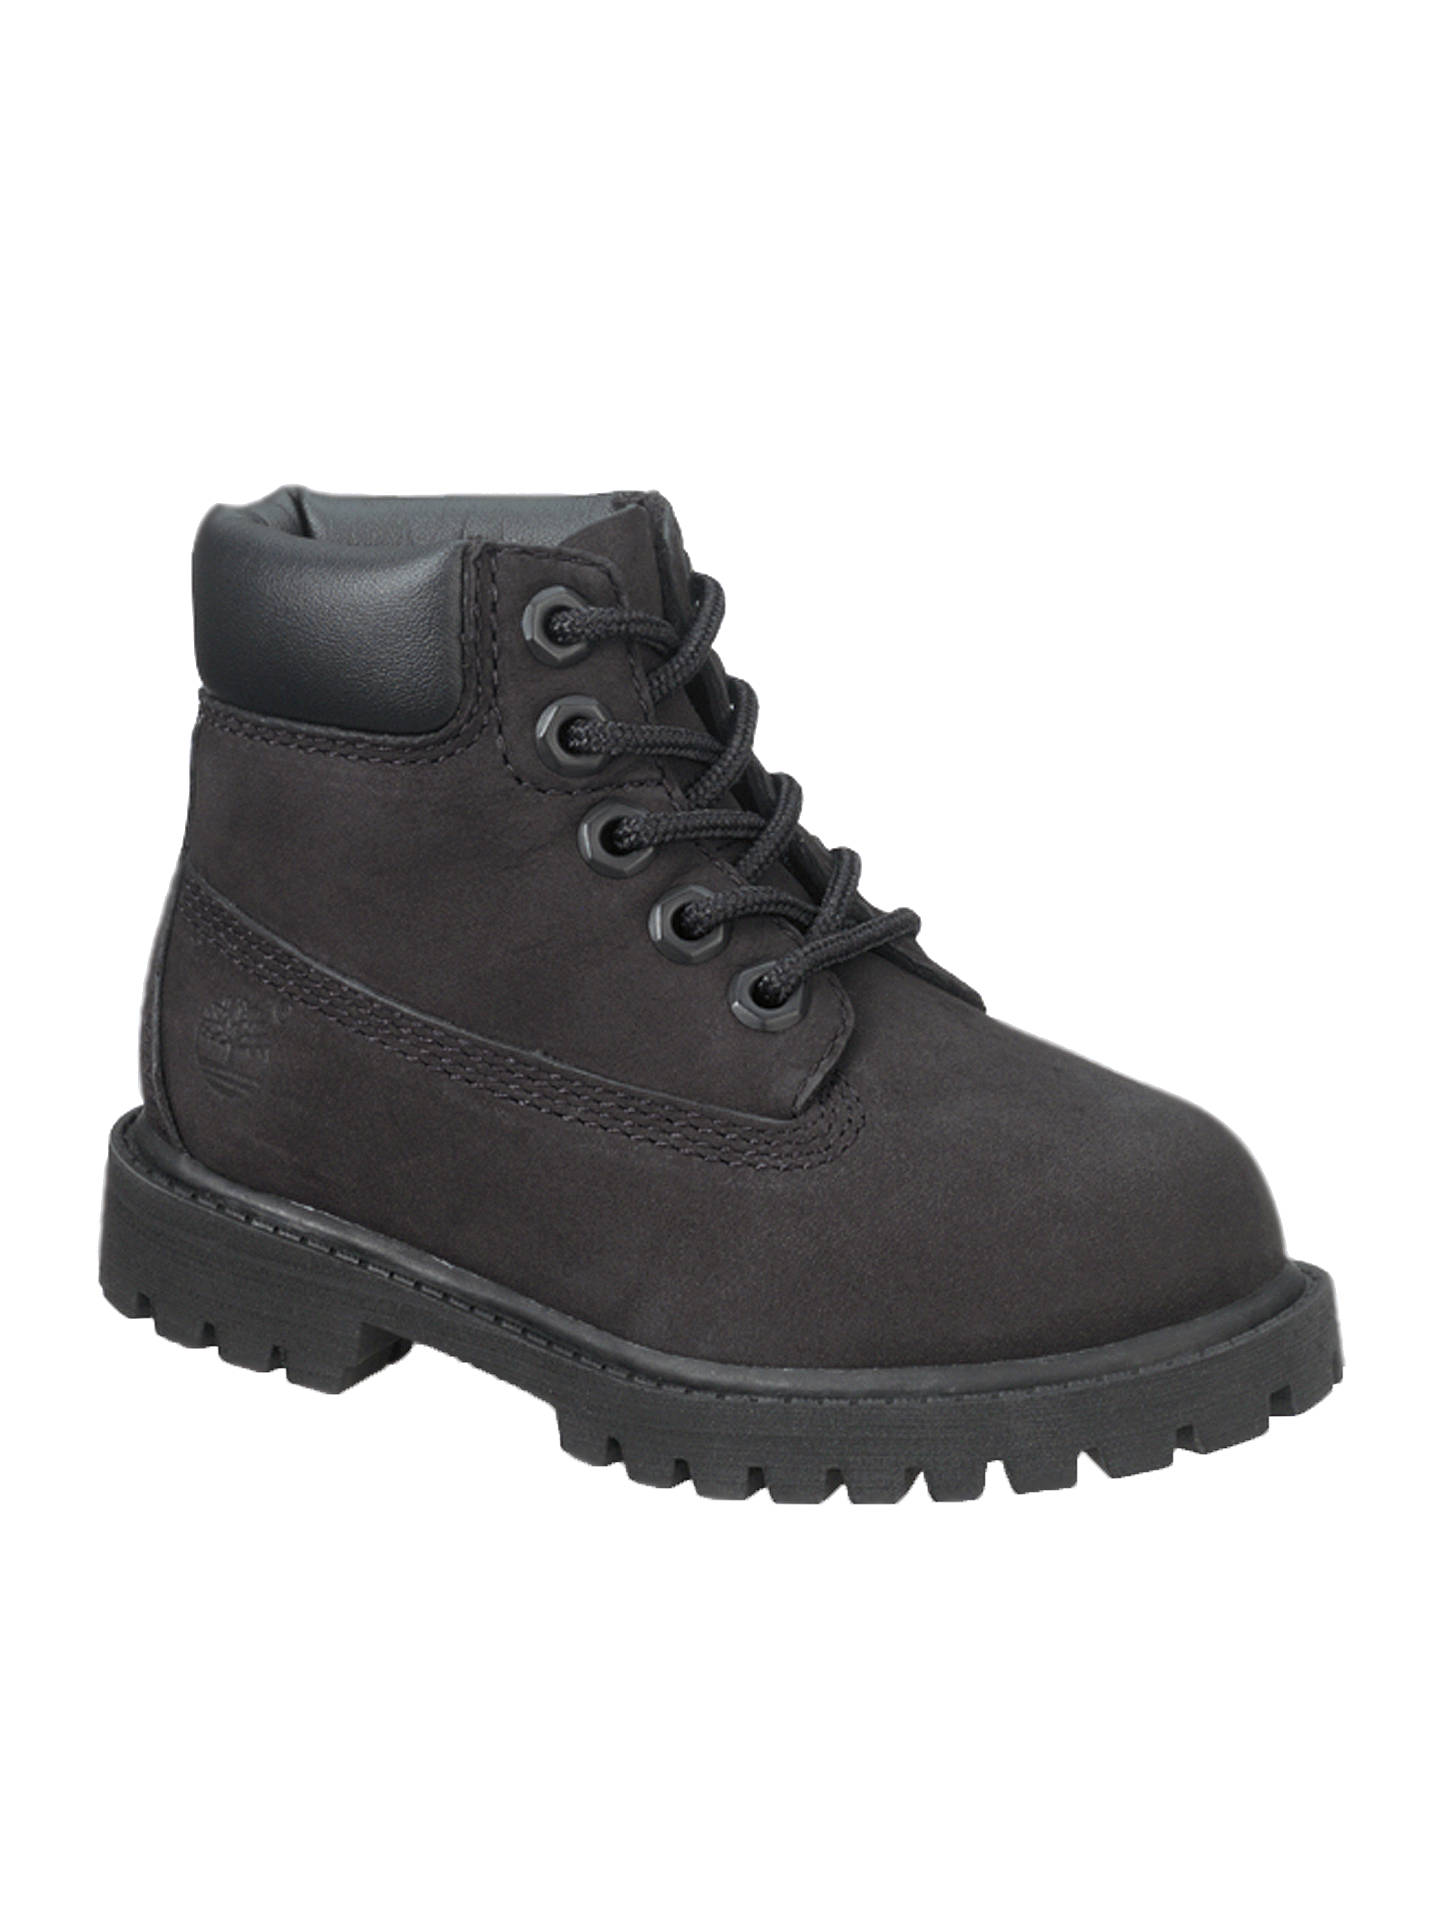 3050871c1c Buy Timberland Children s Waterproof Nubuck Leather Boots